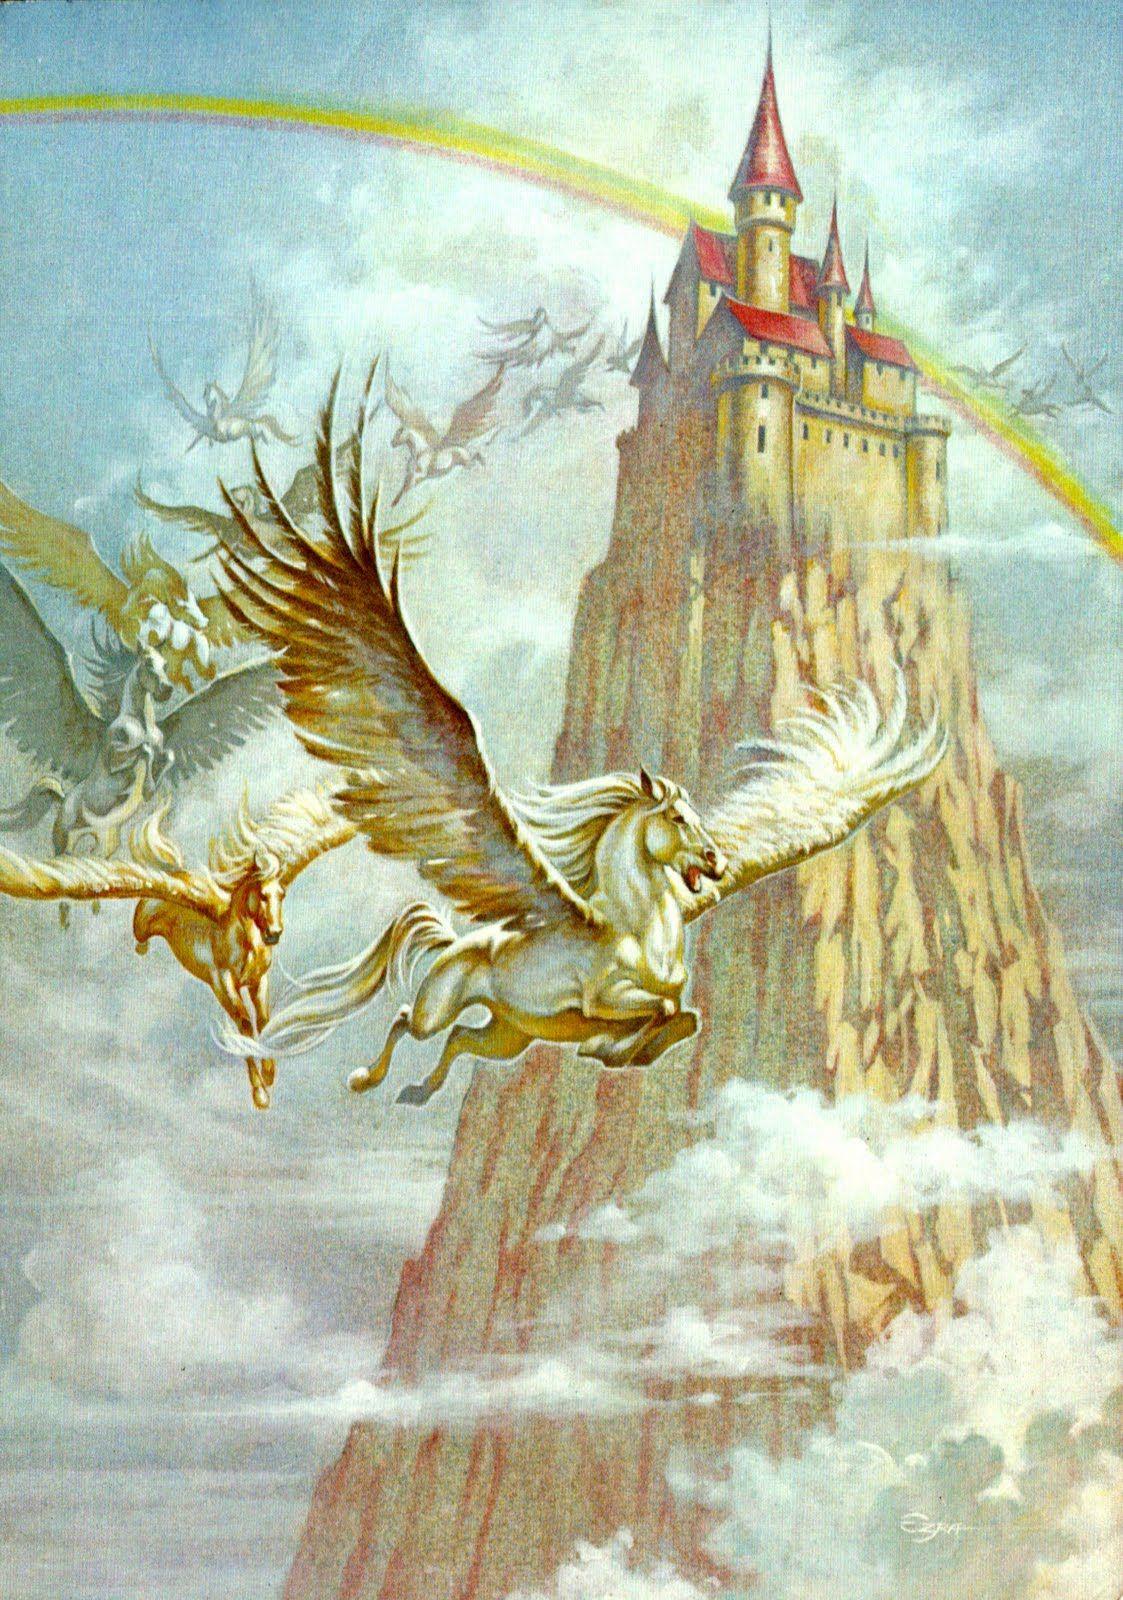 Pegasus | Pegasus art, Fantasy horses, Magical horses